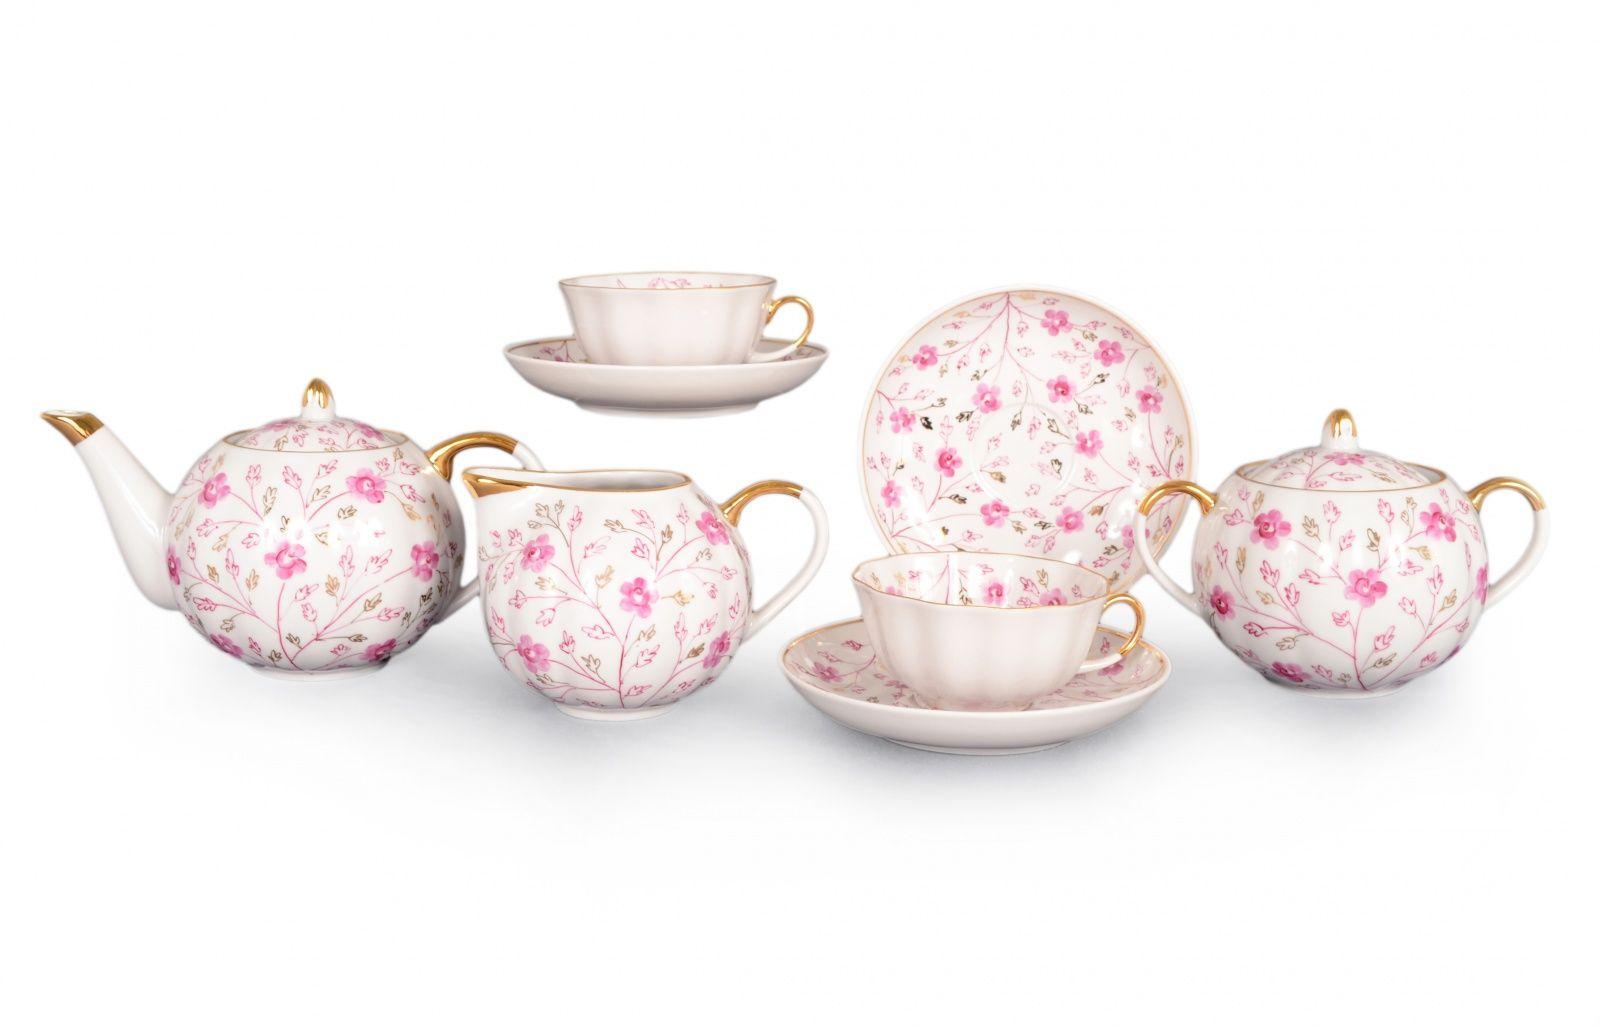 Dulevo porcelain / Tea set 15 pieces Apple blossom